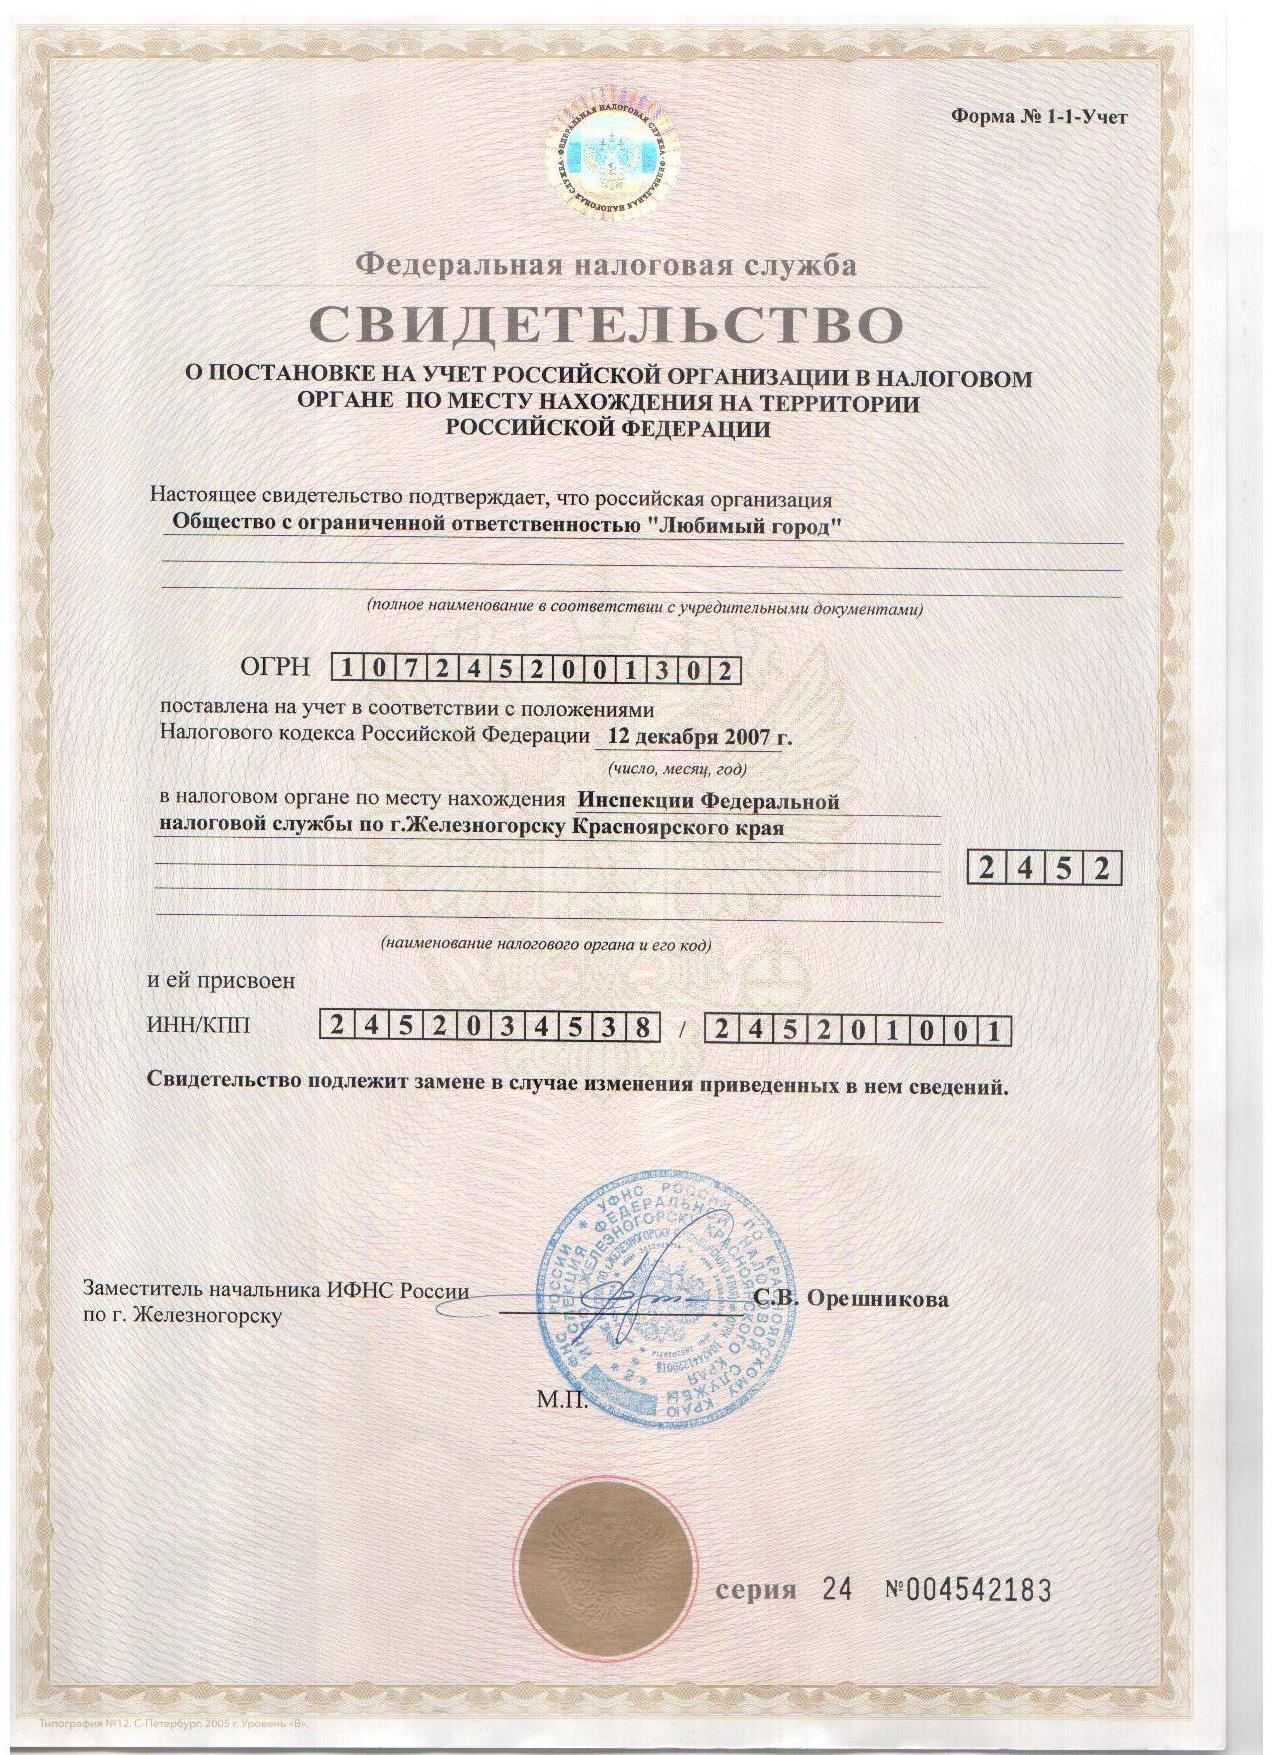 Актуальная база квартир Железногорска Красноярского края